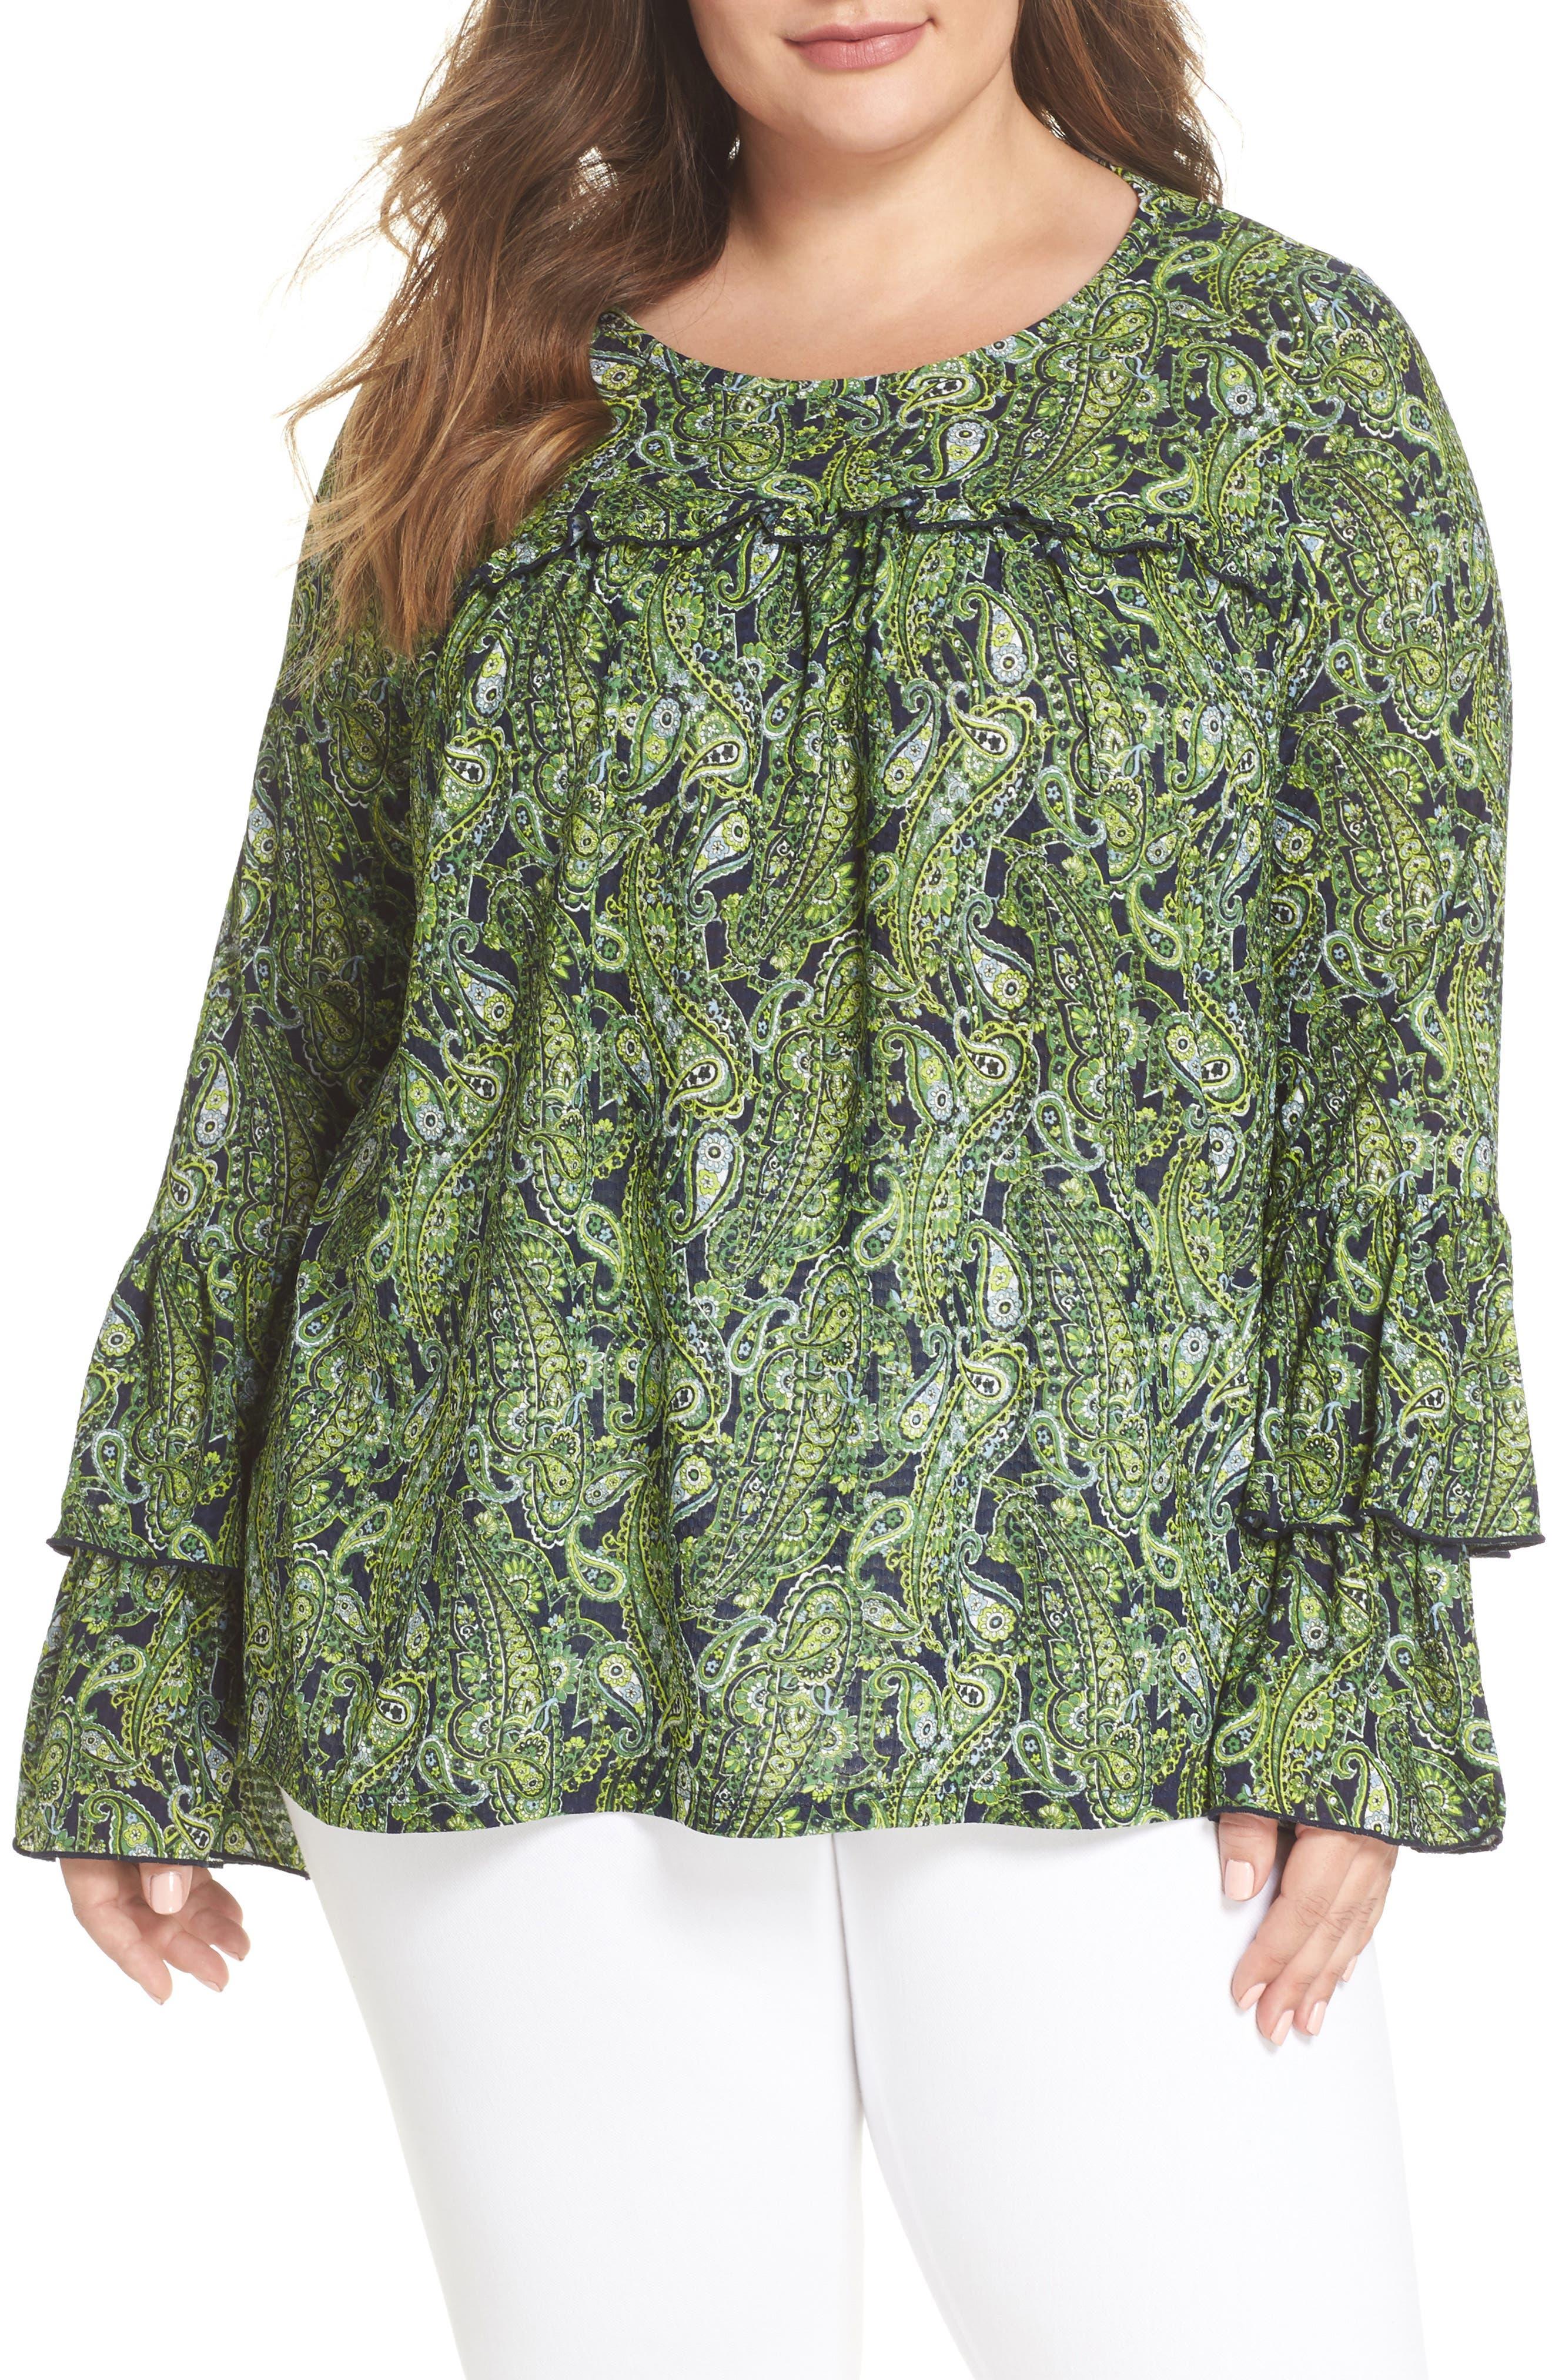 Pais Tier Sleeve Blouse,                         Main,                         color, True Navy/ Green Apple Mu